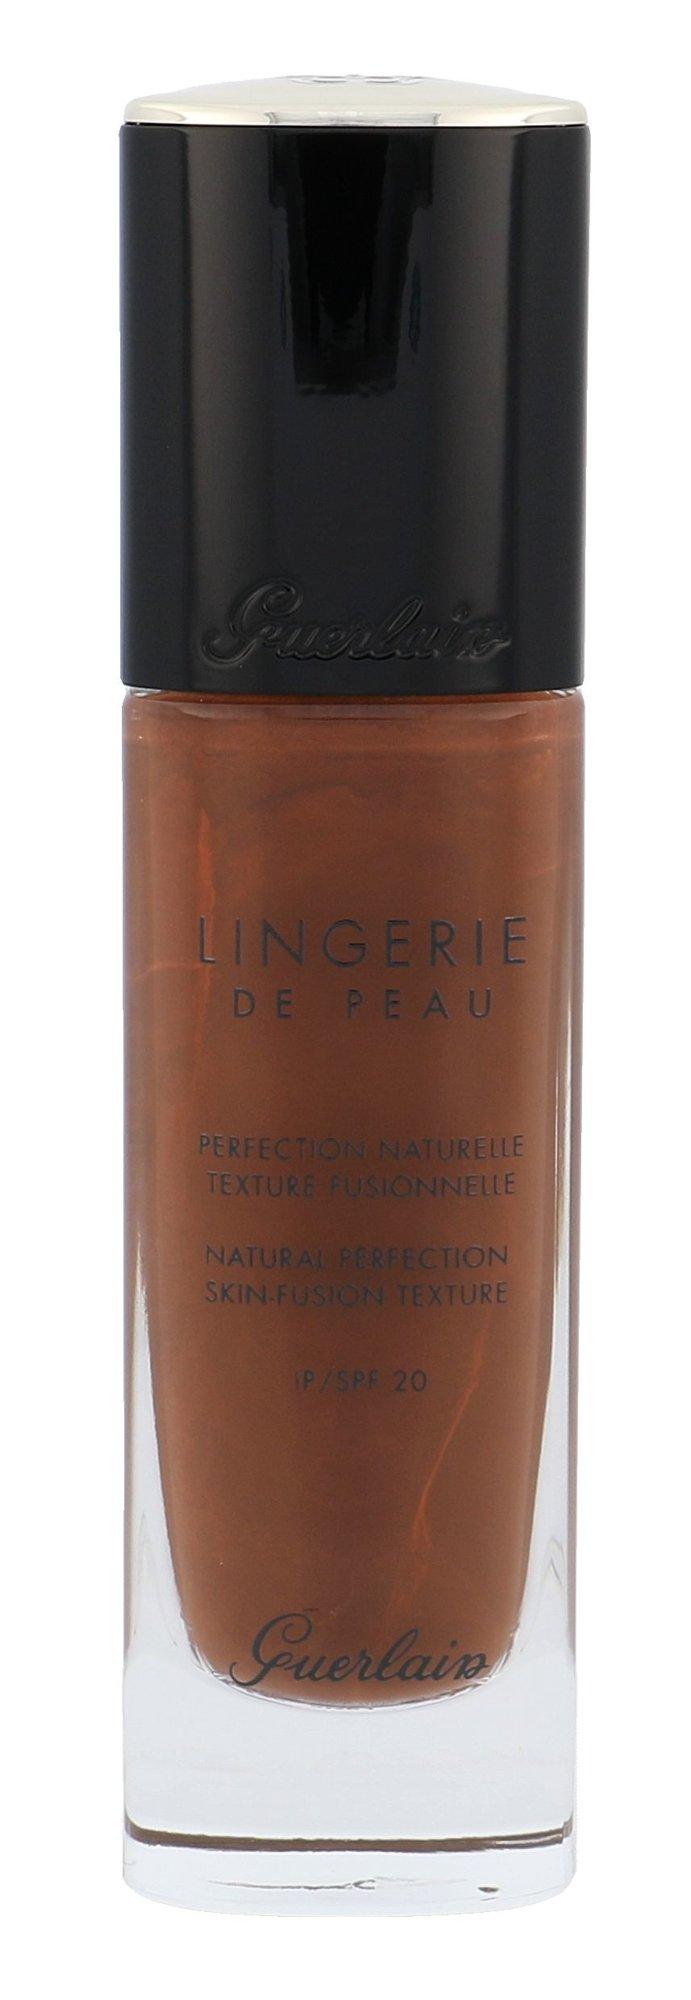 Guerlain Lingerie De Peau Cosmetic 30ml 06C Very Deep Cool